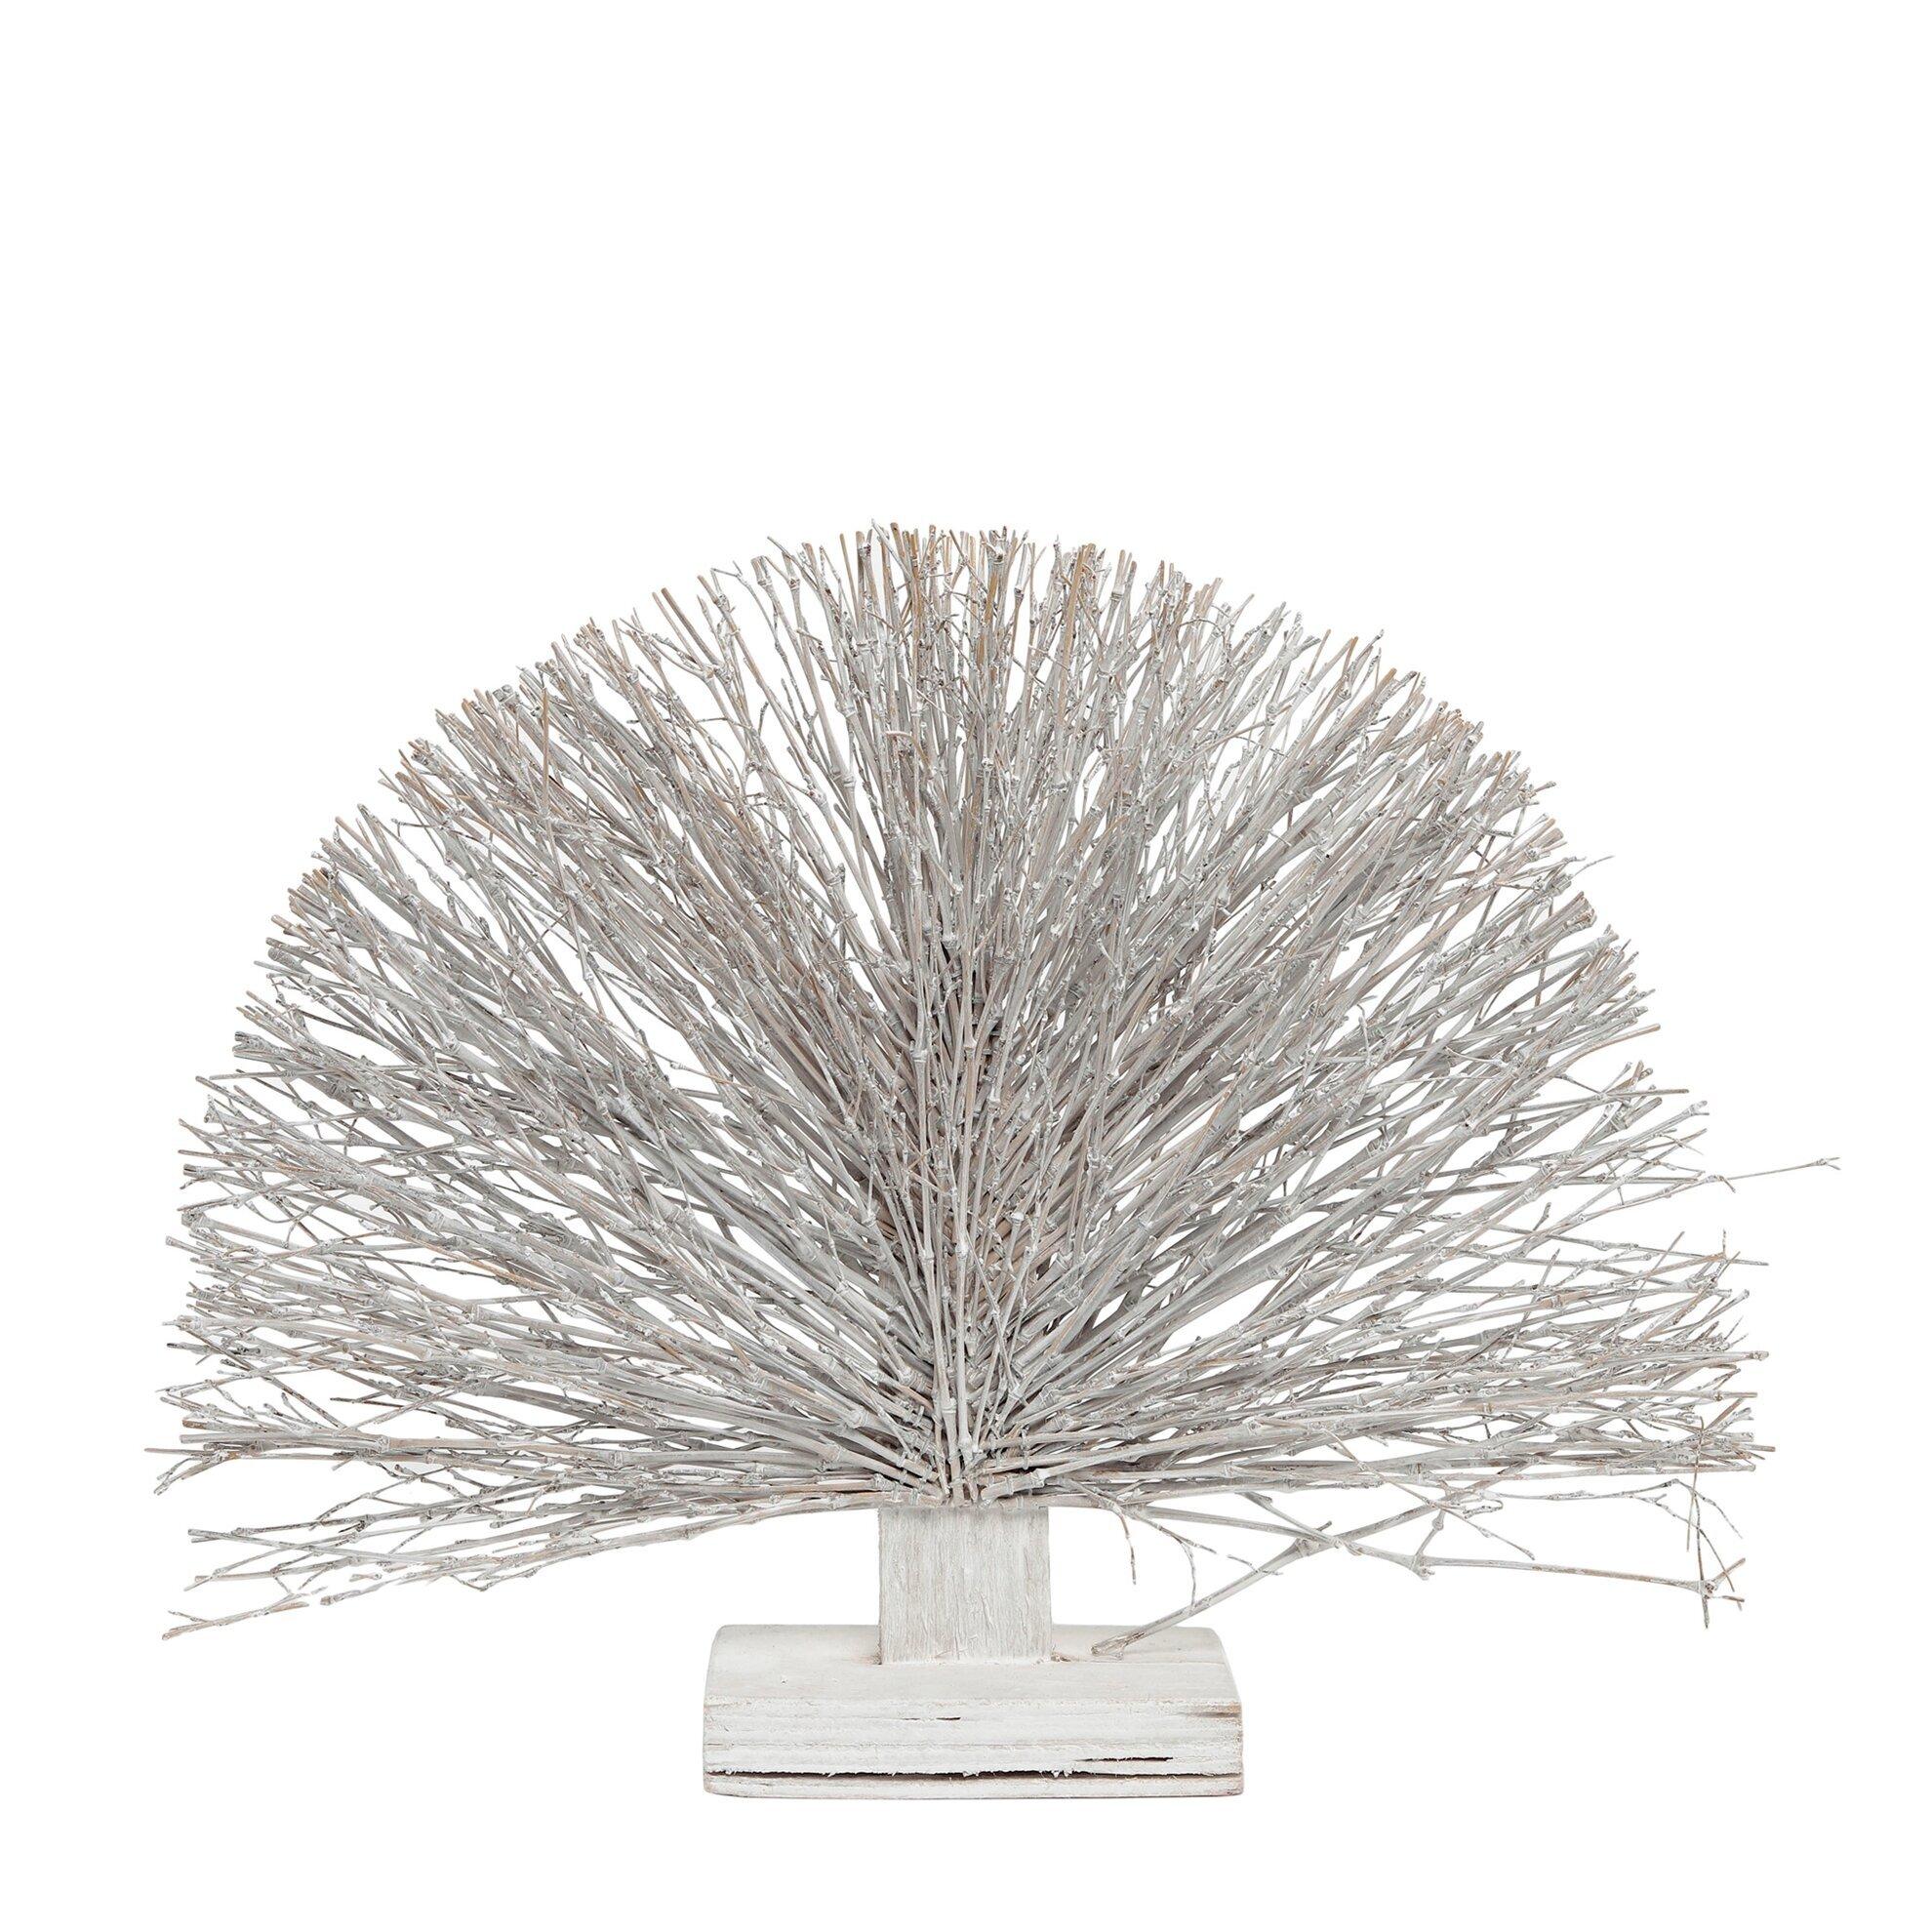 Dekoratif Obje - Bambu Dalları (6x46x40cm)